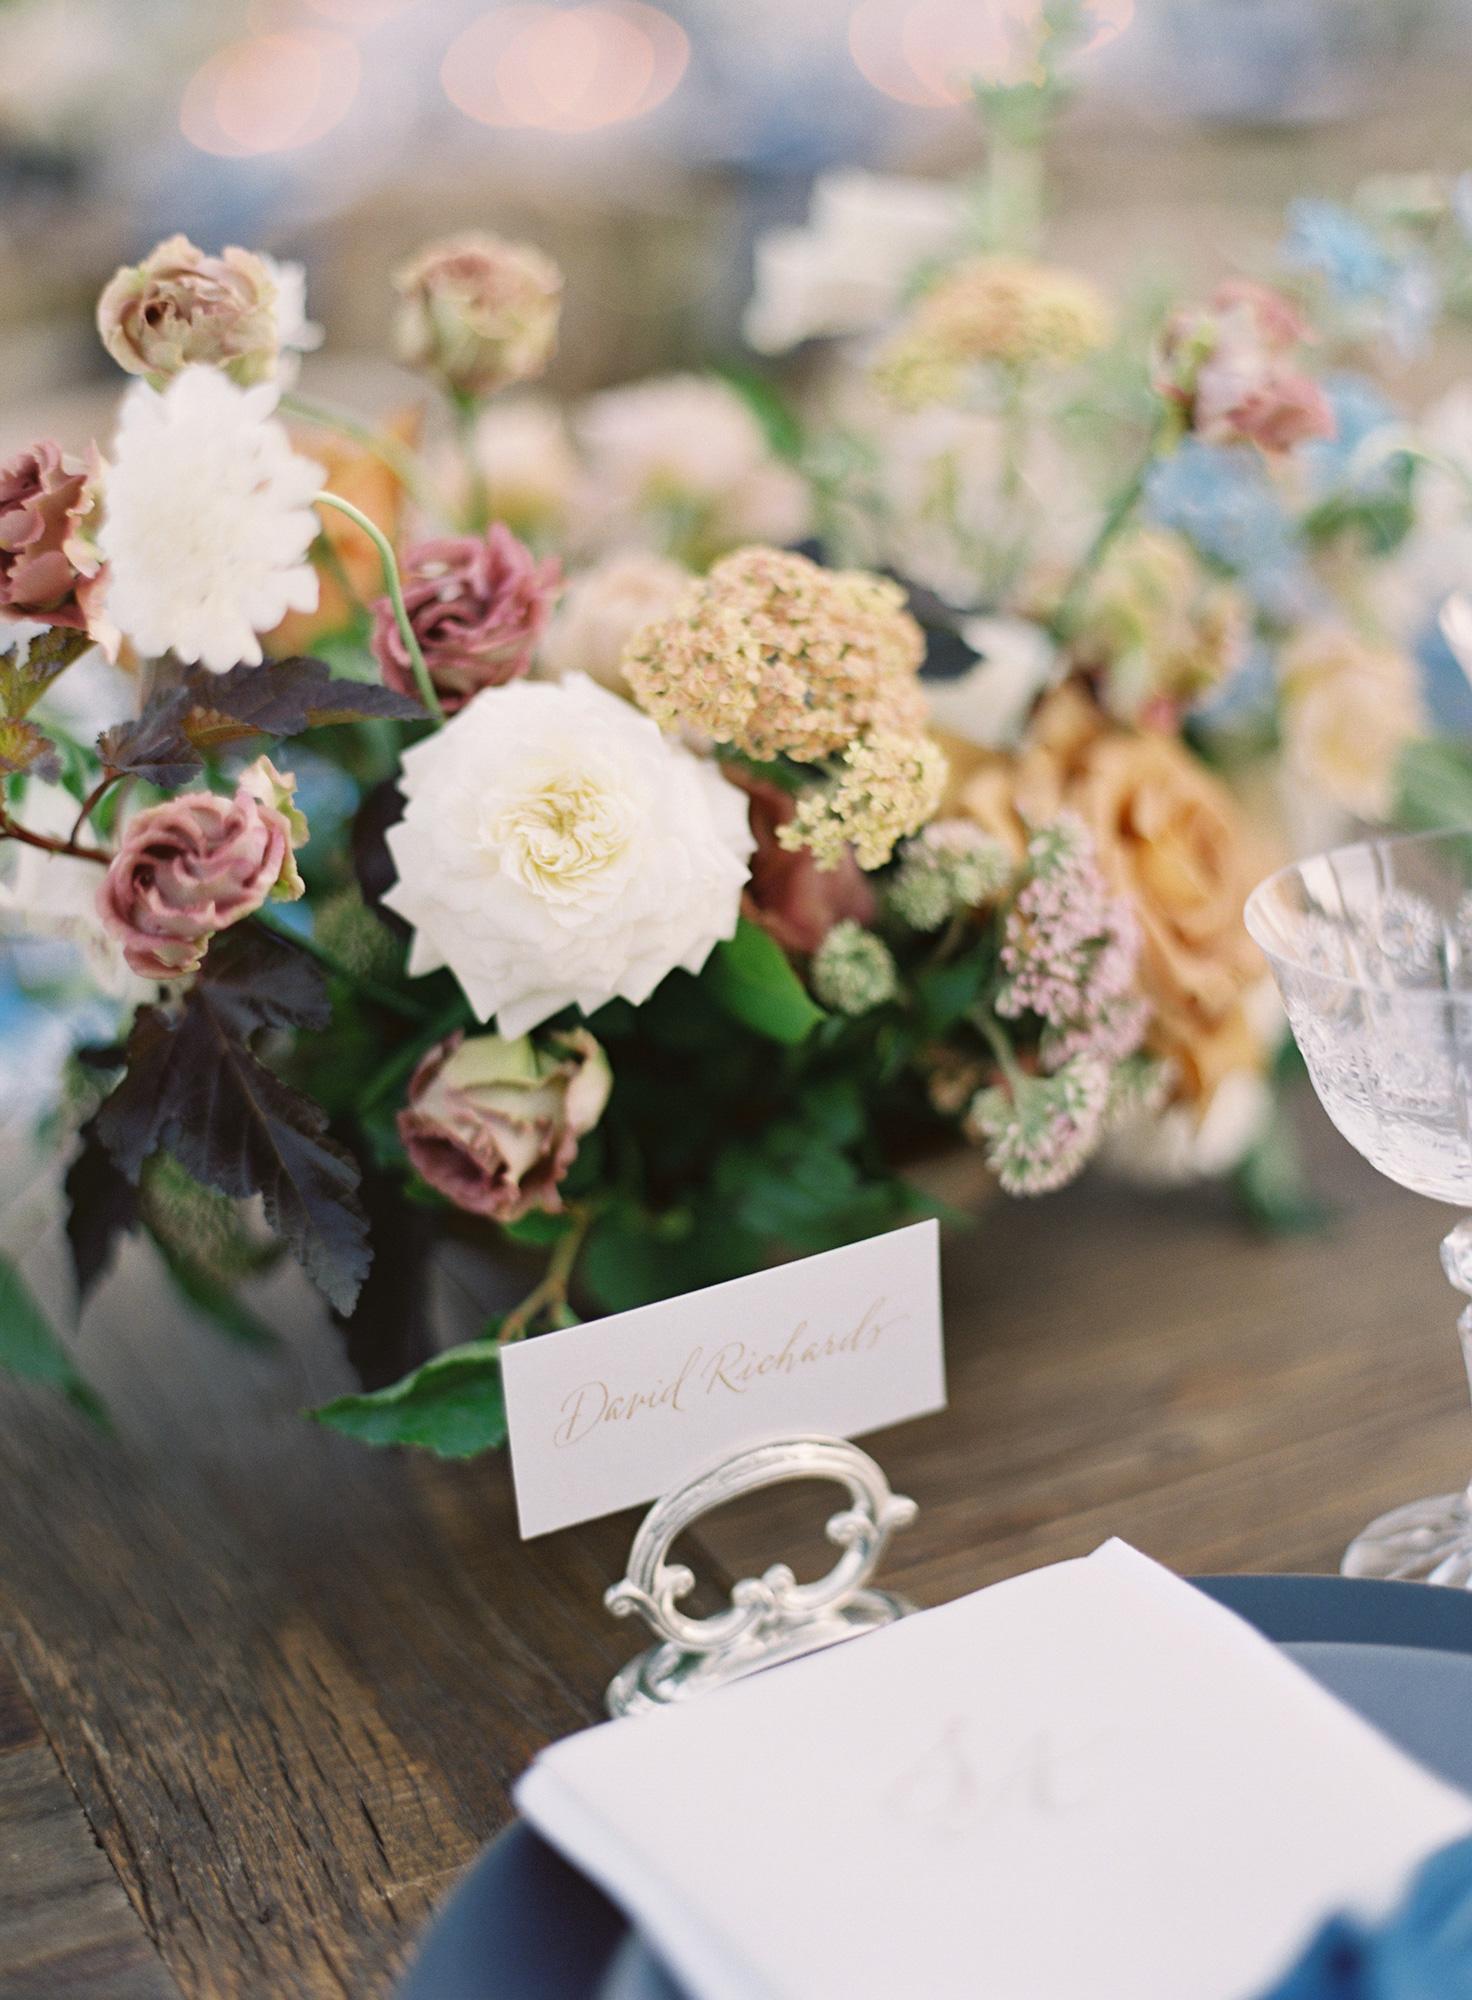 floral centerpieces white tan and mauve blooms